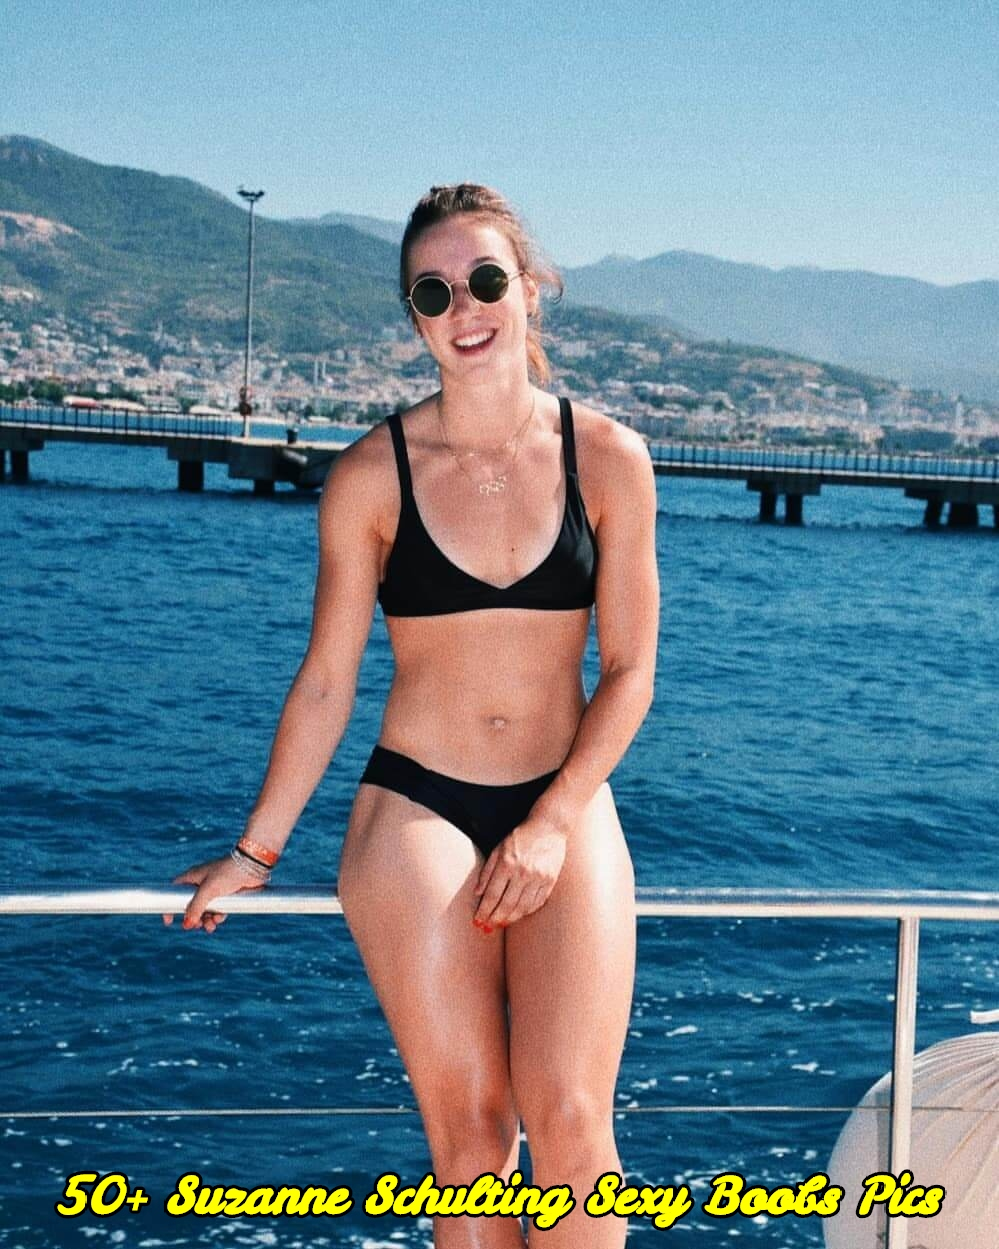 Suzanne Schulting sexy boobs pics